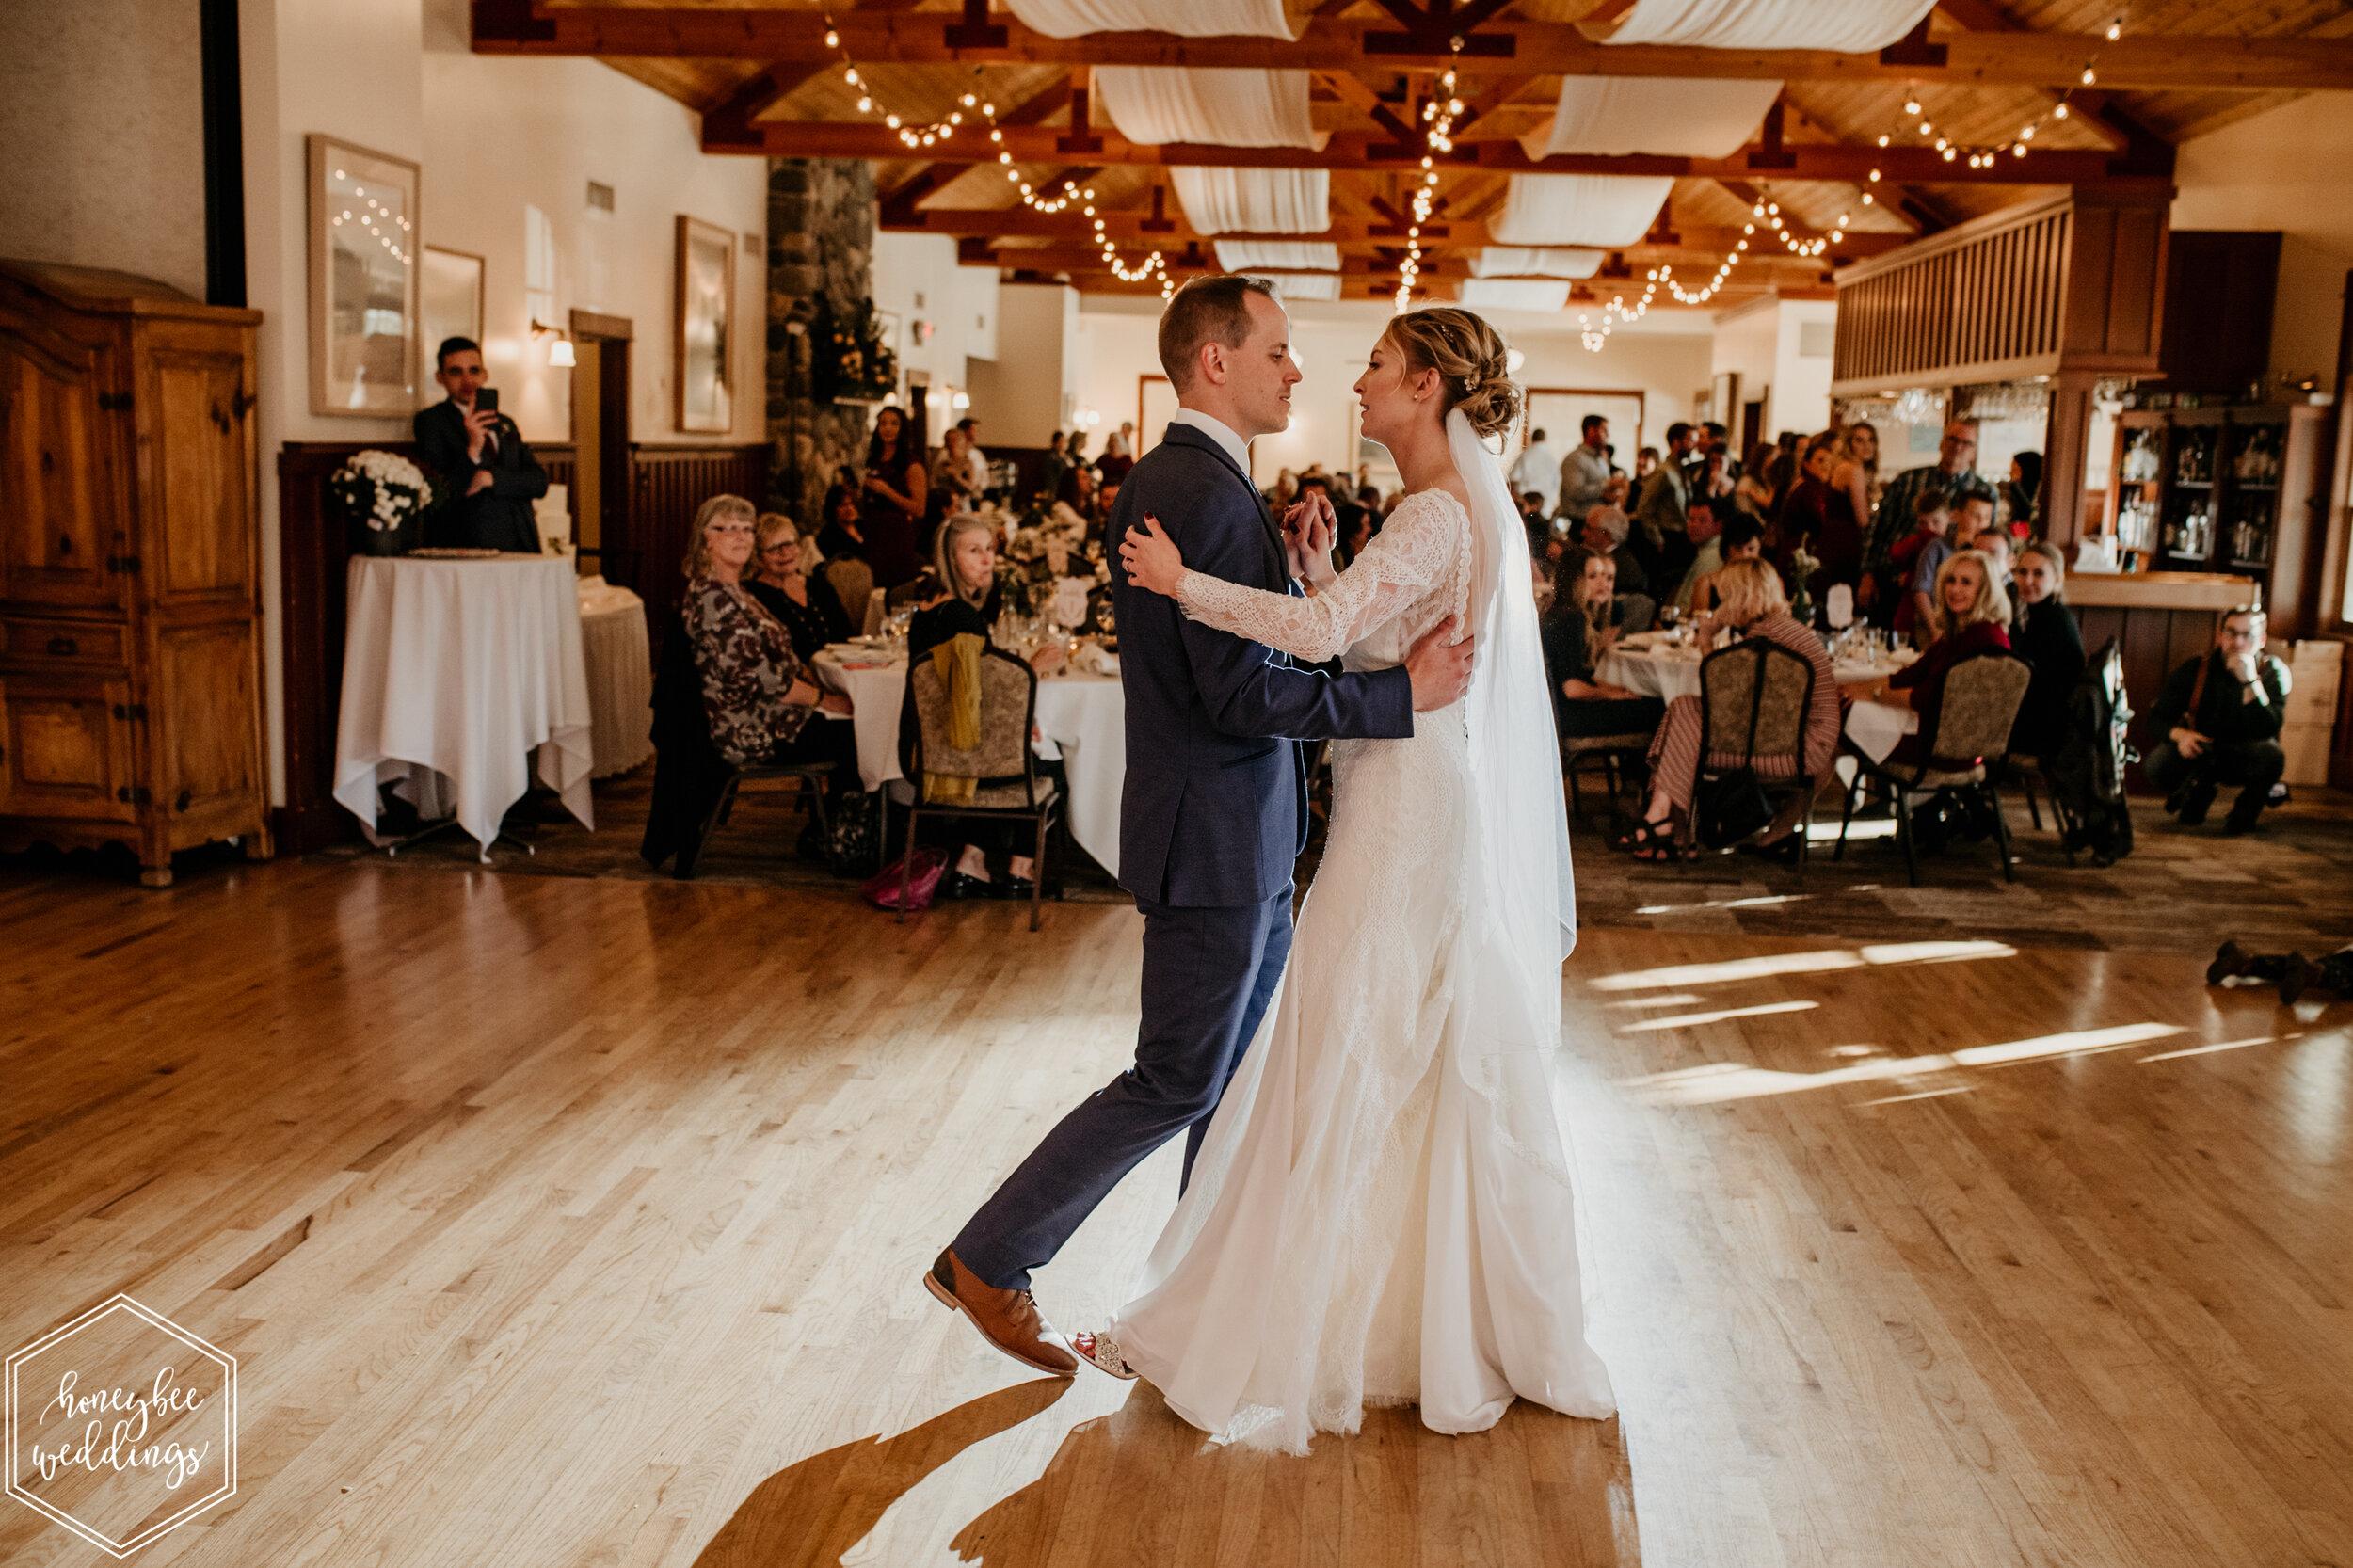 146Chico Hot Springs Wedding_Montana Wedding Photographer_Winter Wedding_Ariel & Richard_October 12, 2019-1768.jpg